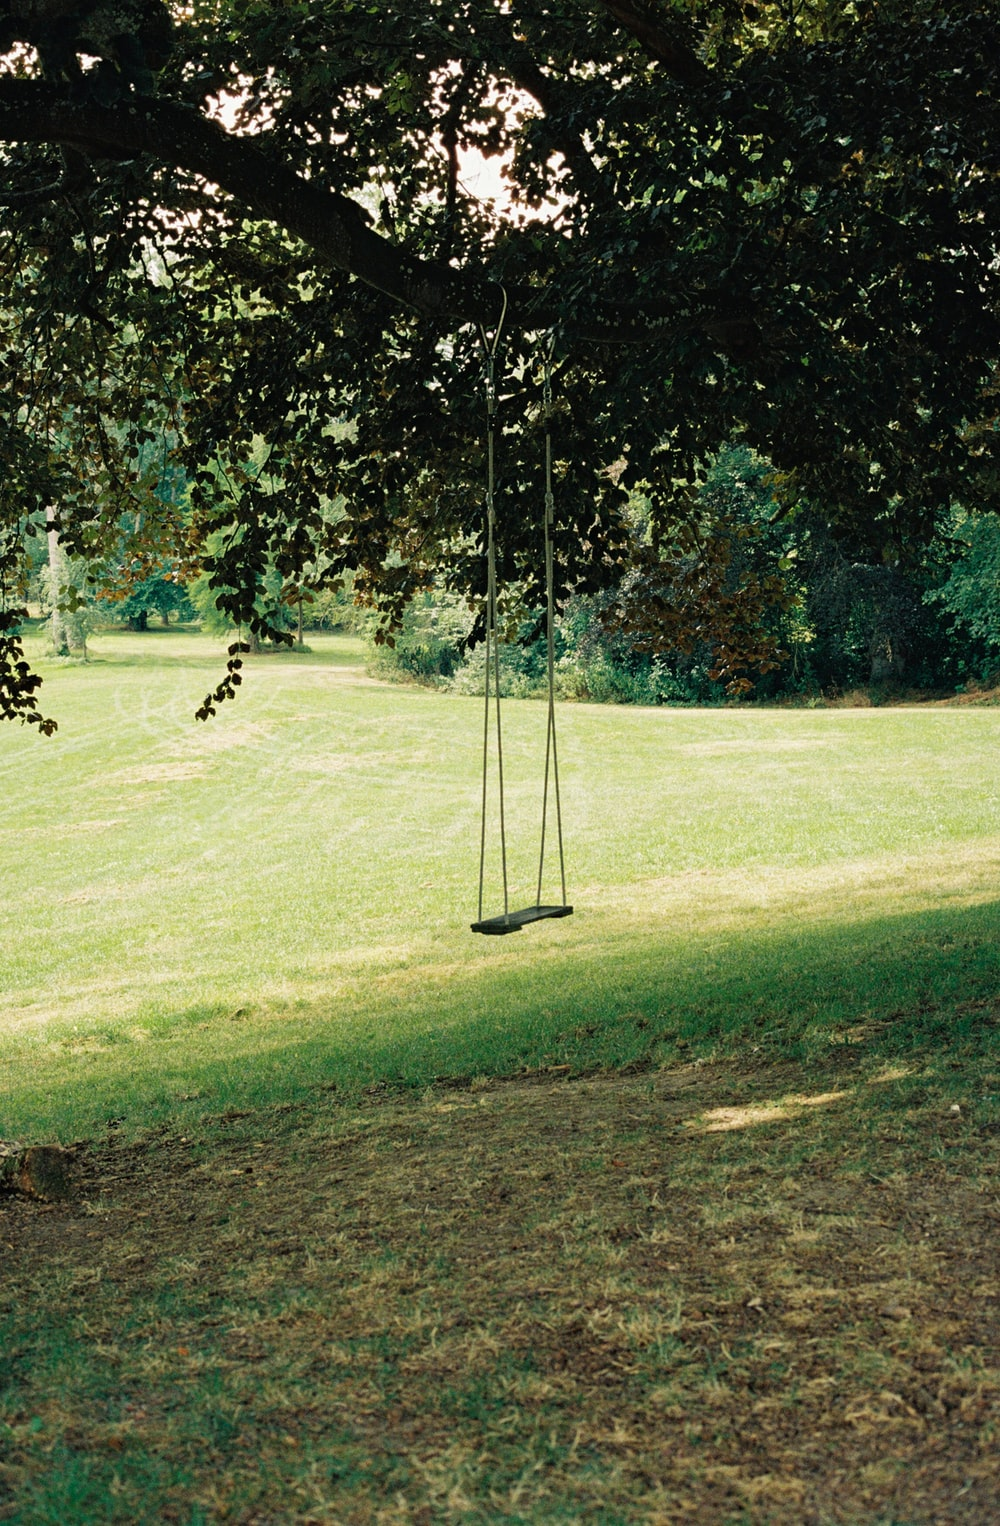 swing tied from tree branch on grass field